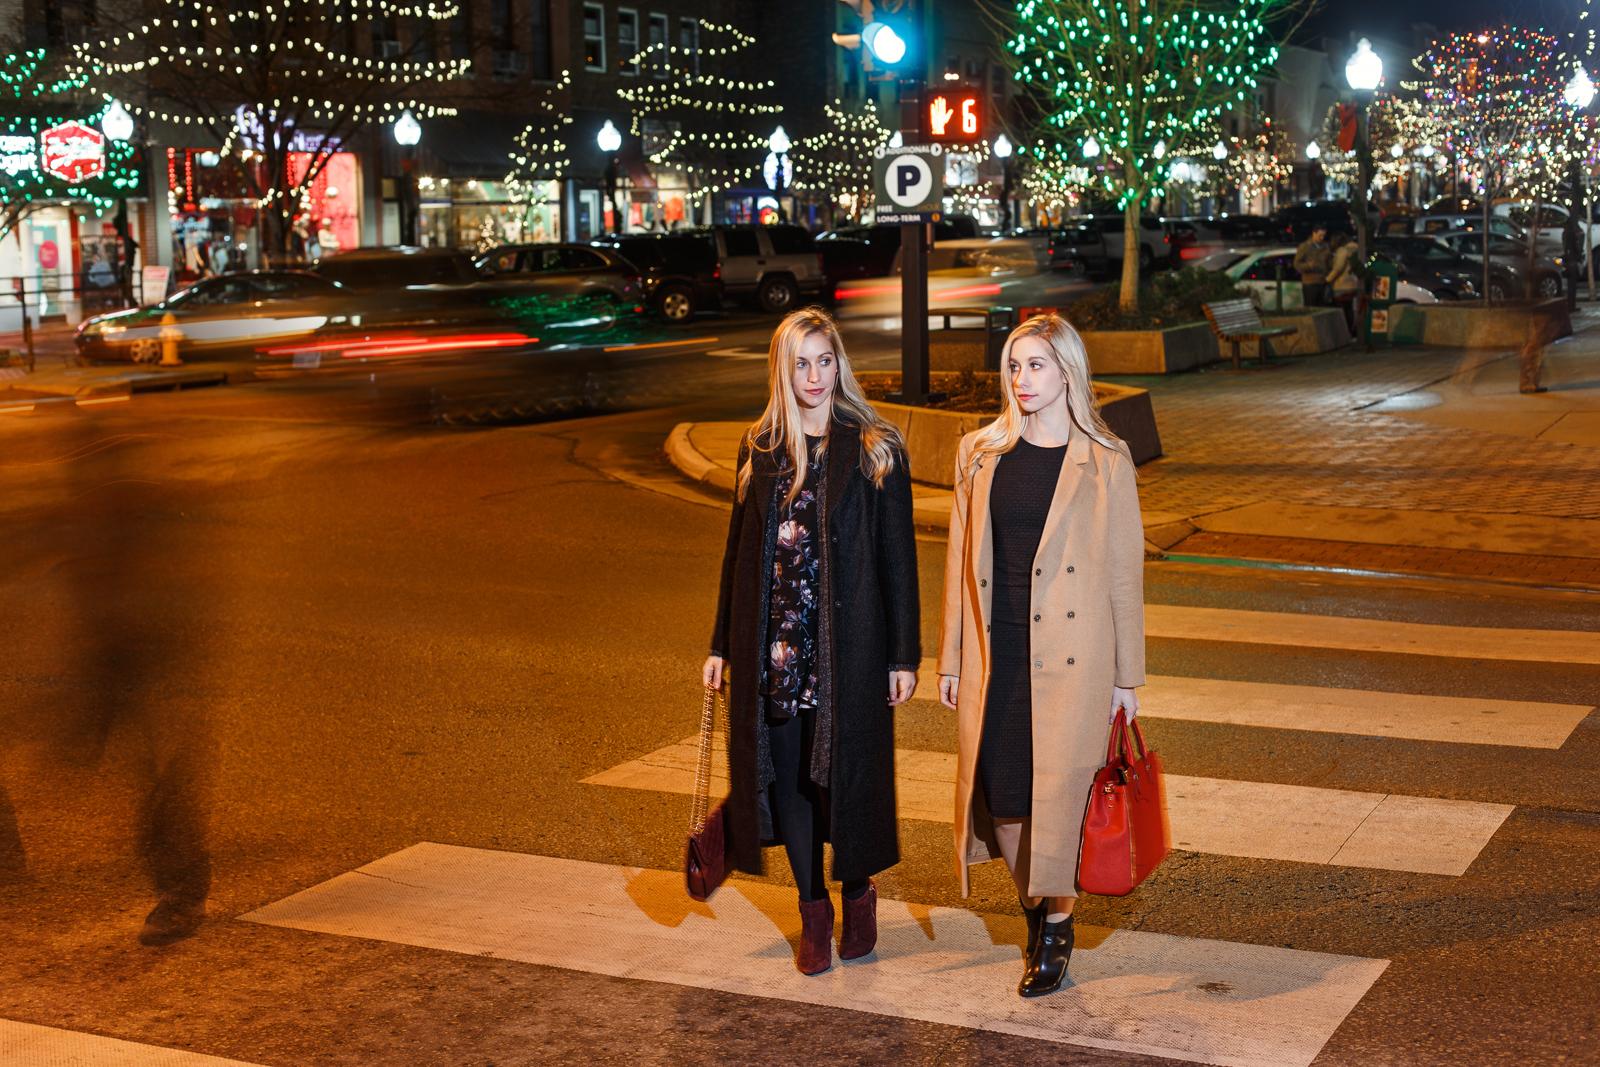 fashionColumnTwins_street_web